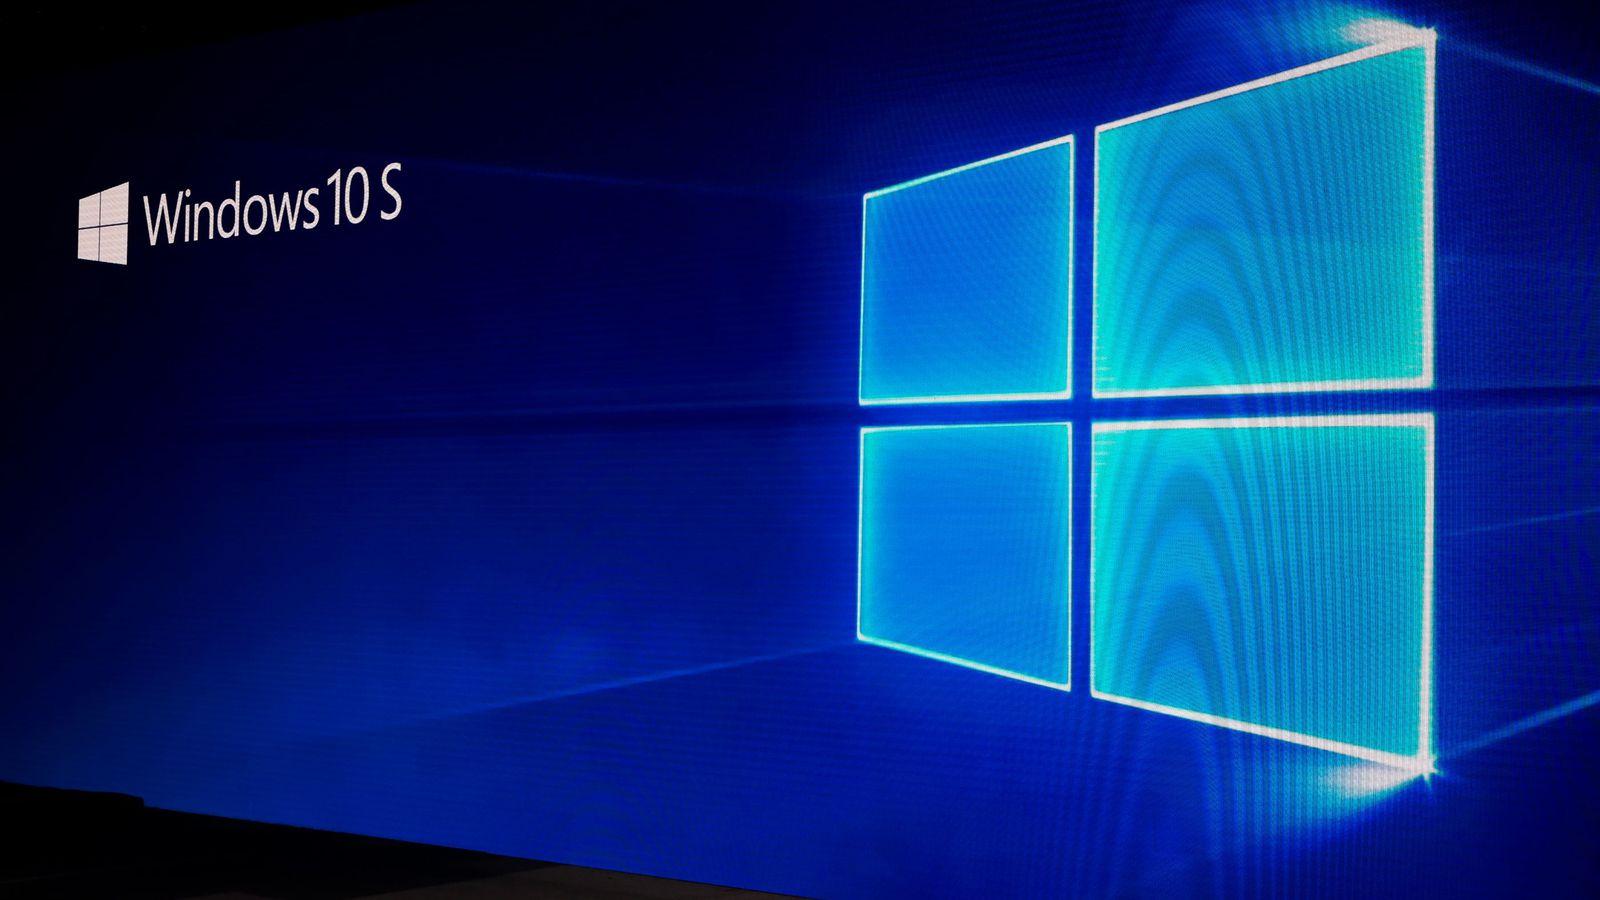 Win Pro Windows Clay : Thatgeekdad microsoft to launch new windows s